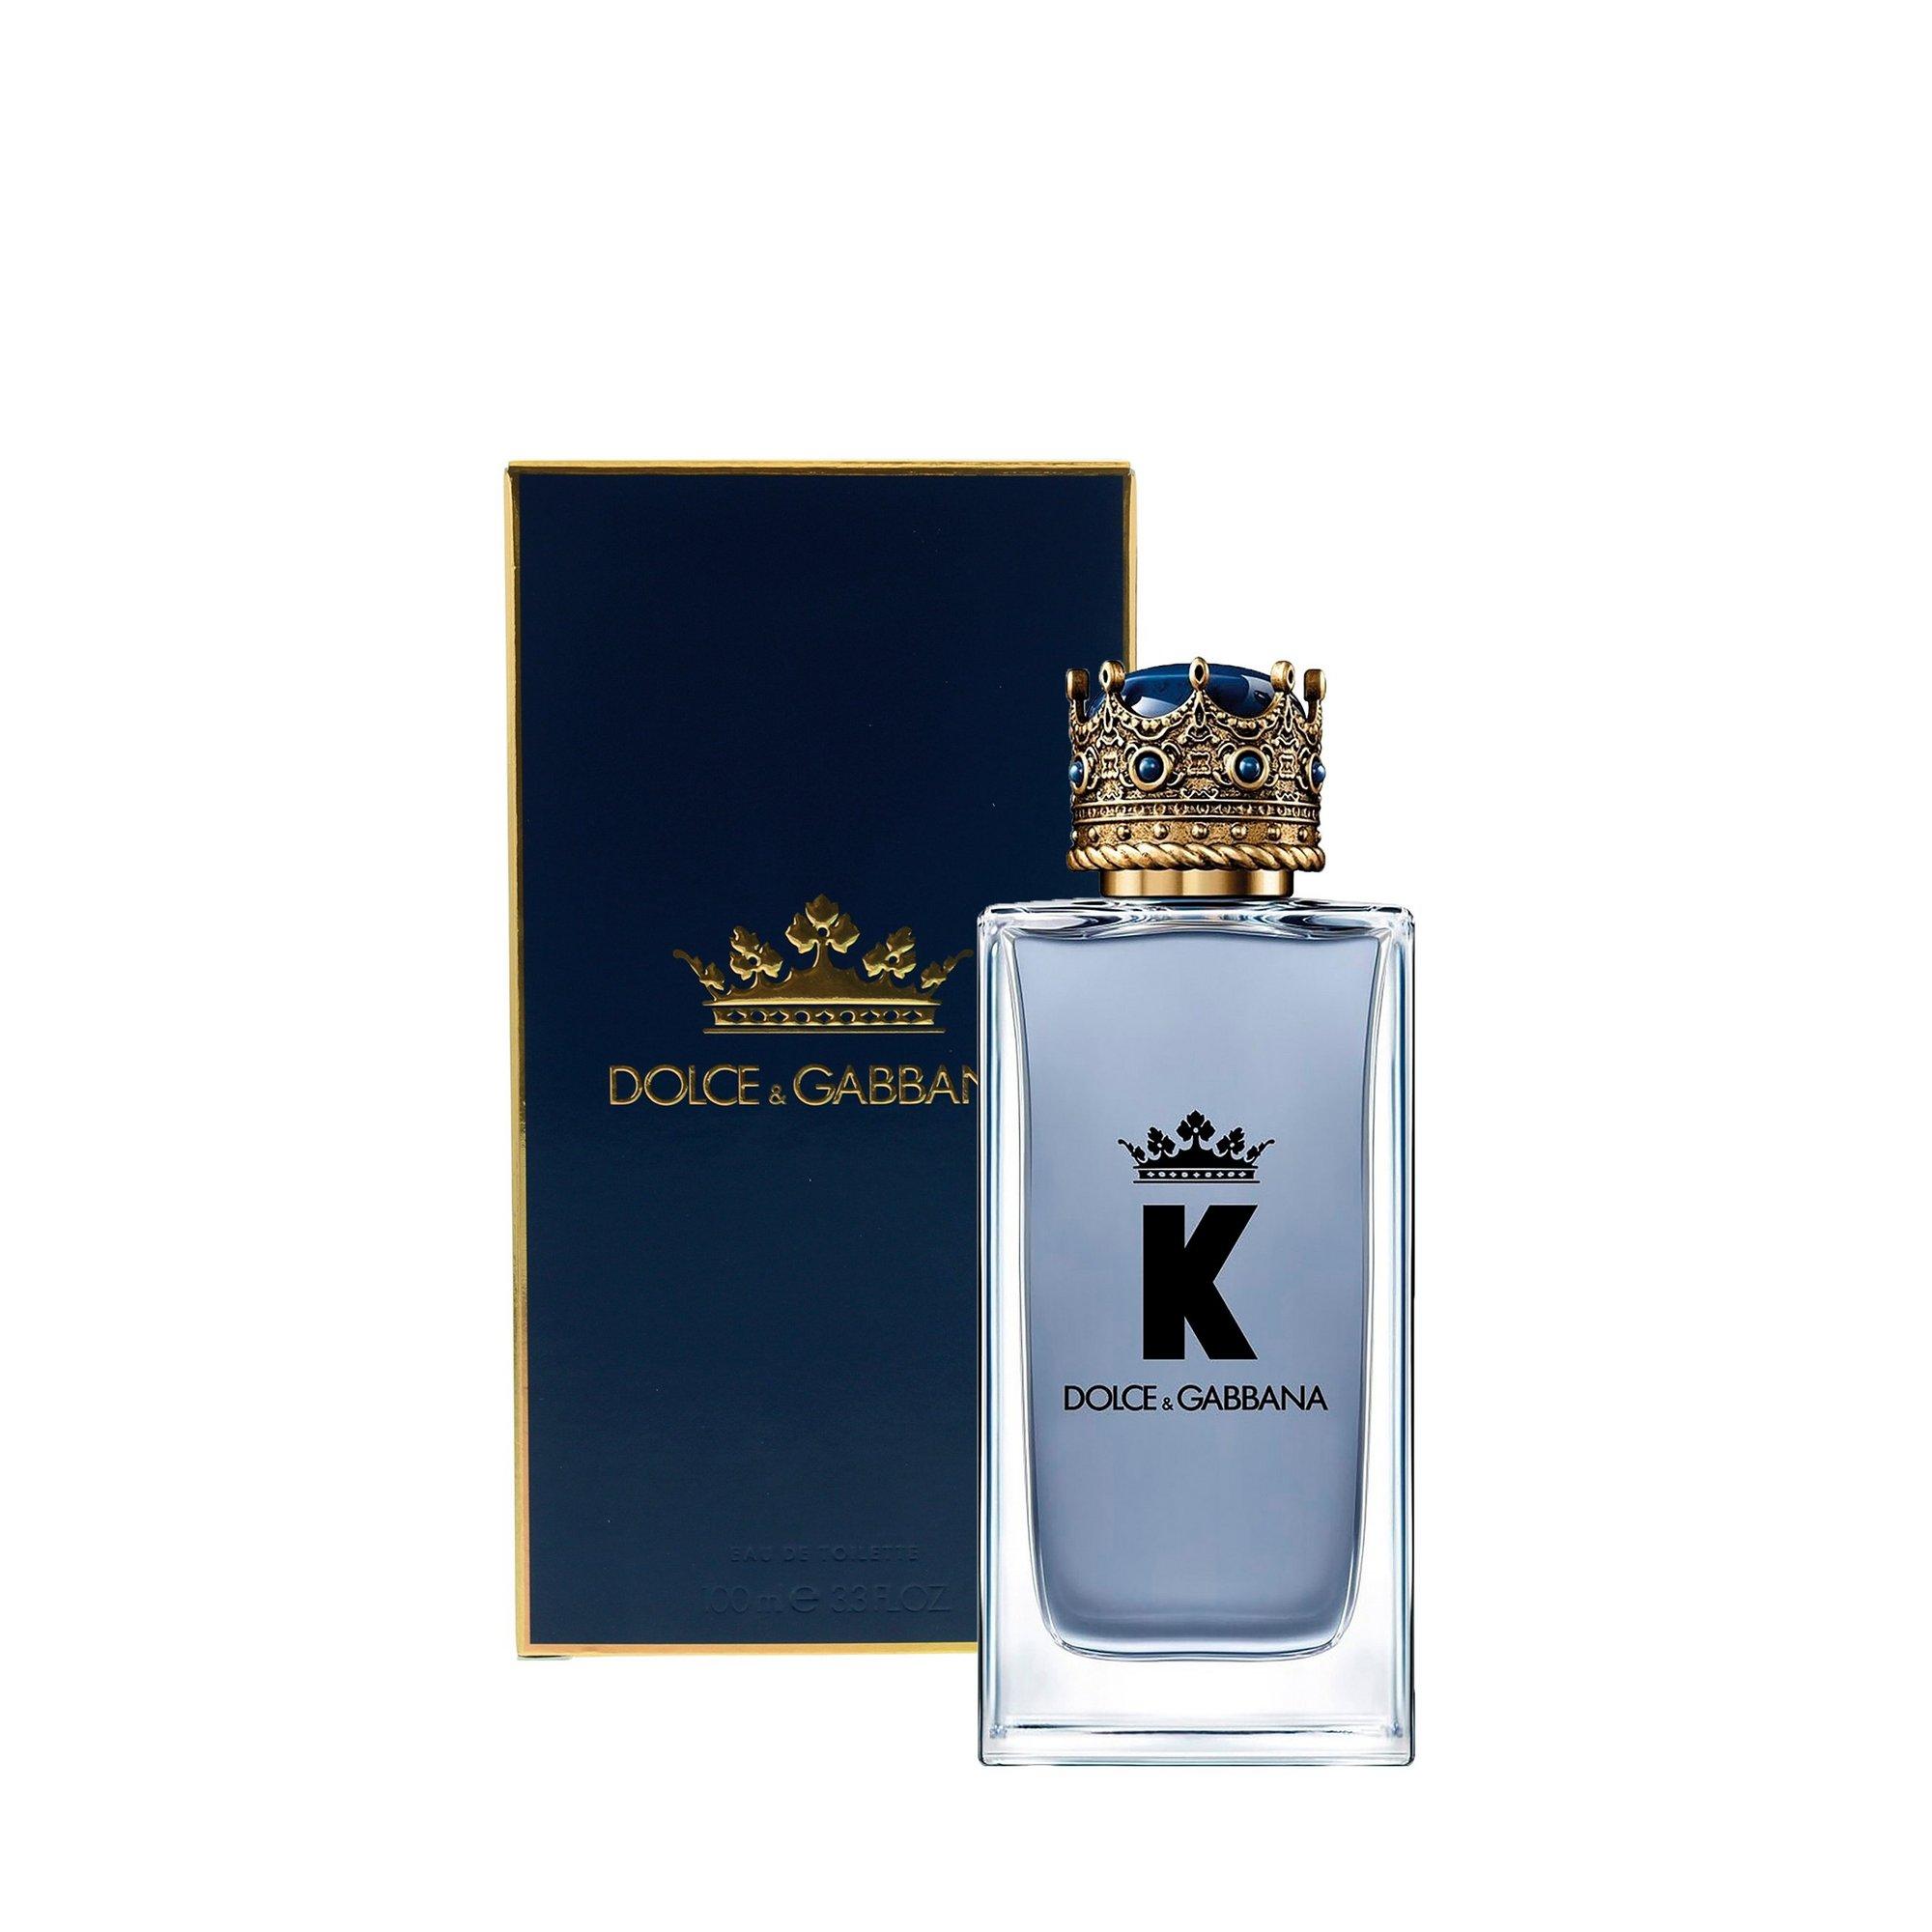 Image of Dolce and Gabbana K Men 100ml EDT